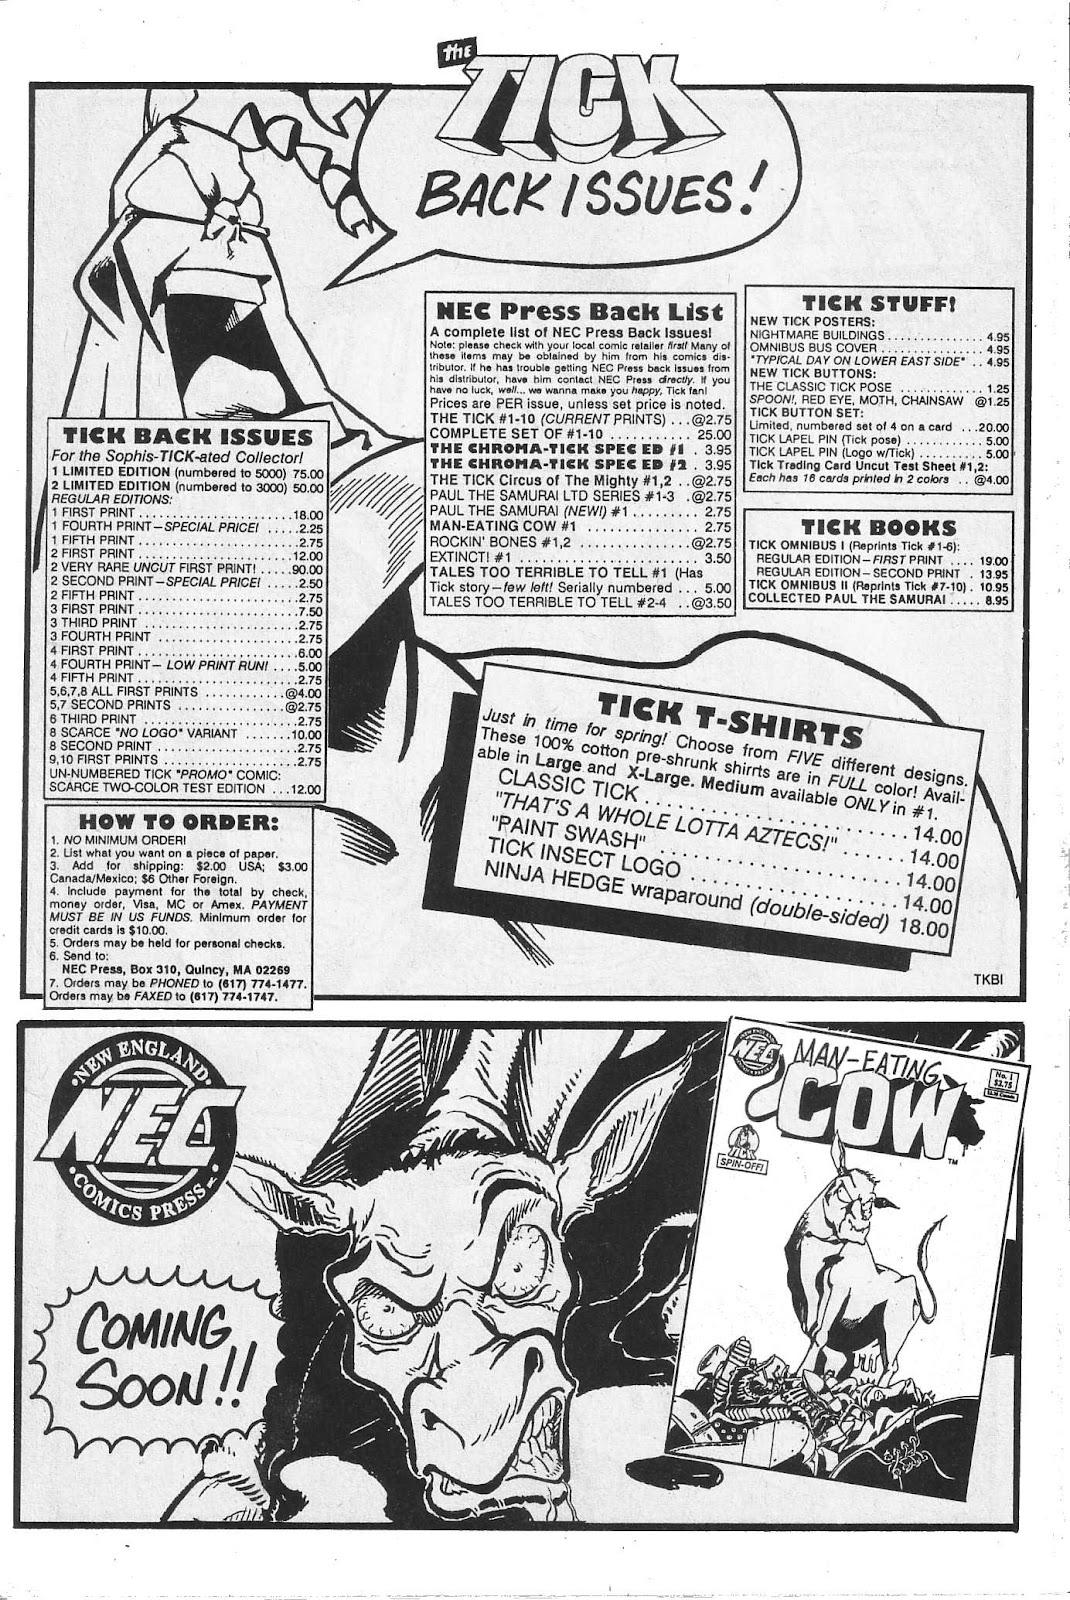 Read online Paul the Samurai (1991) comic -  Issue # TPB - 98